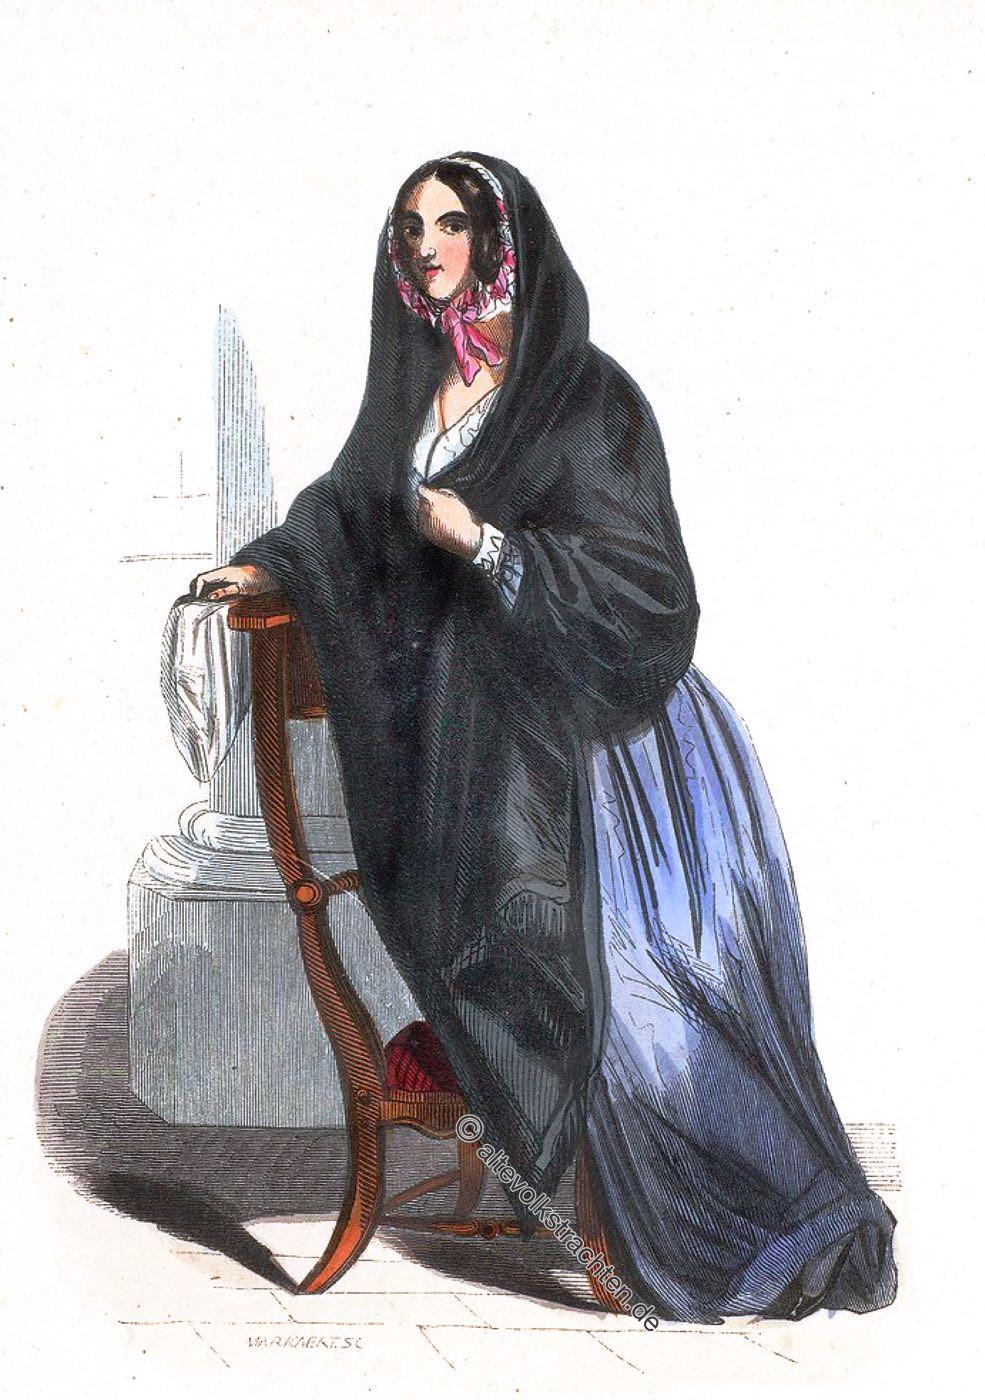 Auguste Wahlen, Kostüm, Tracht, Volkstrachten, Brüssel, Belgien, Bruxelles, Brussels, silk fabric, costume,